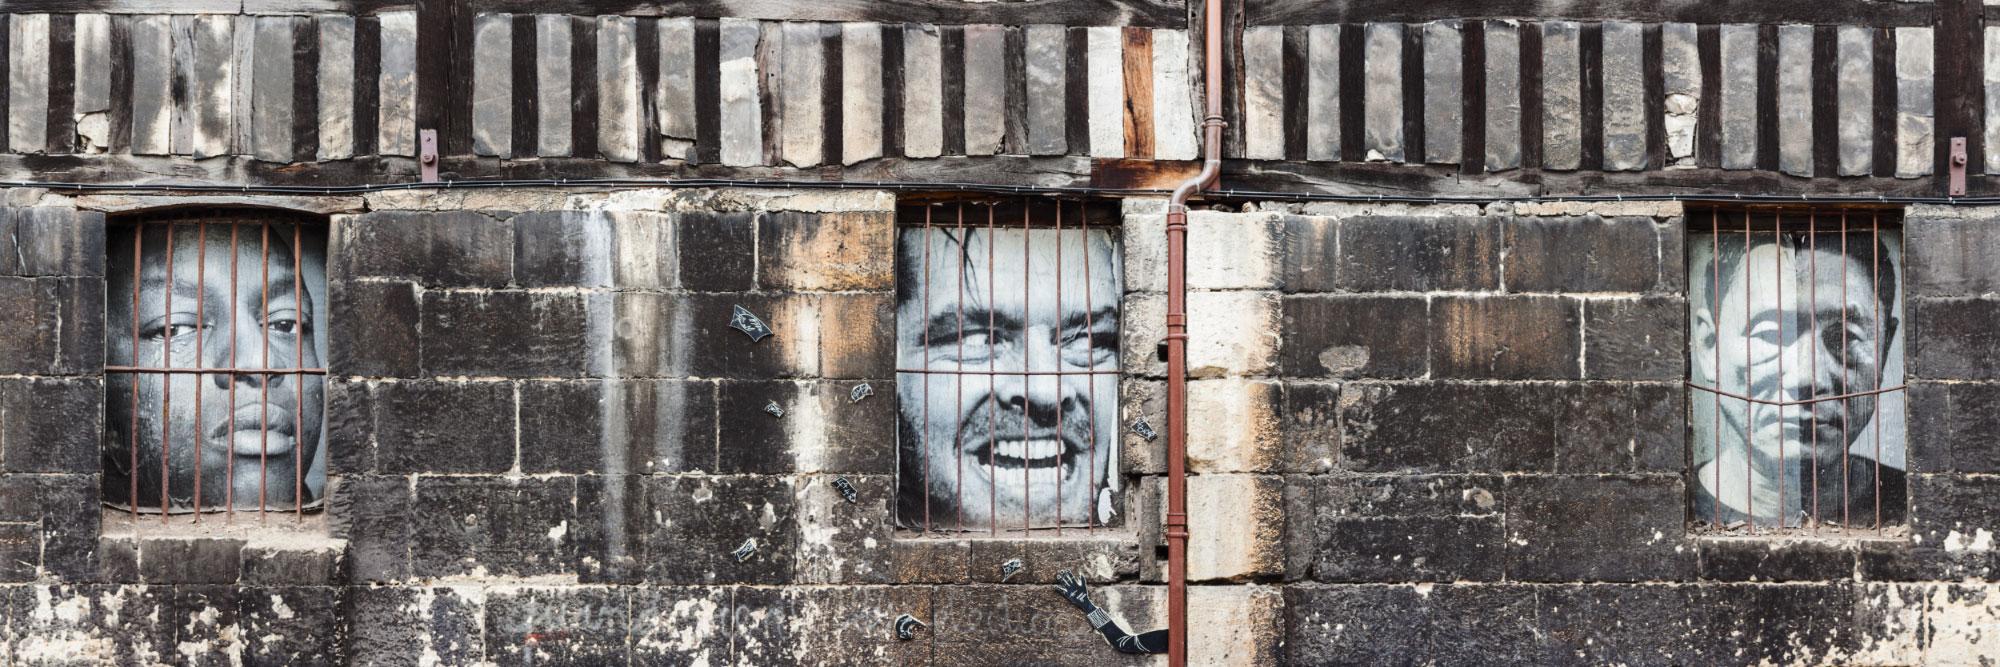 Graff, art de la rue, rue Géricault, Rouen / Hugo Fabe